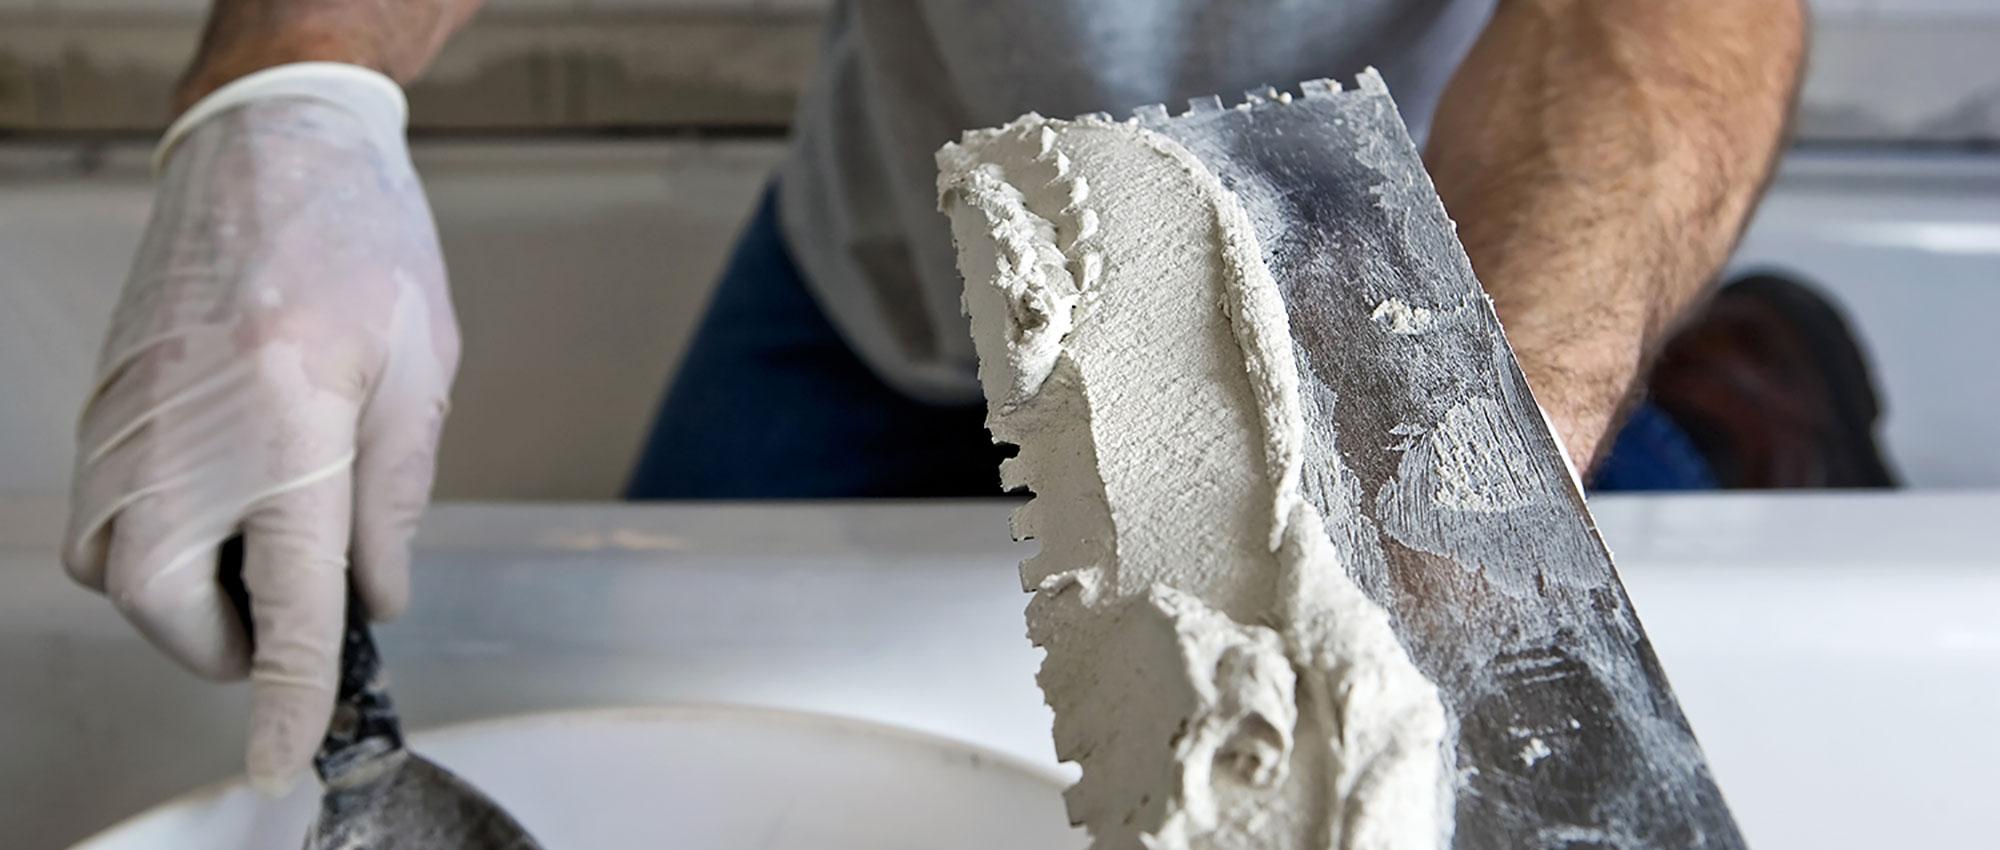 Offerte di lavoro per piastrellista 28 images muratore piastrellista a treviso kijiji - Muratore piastrellista torino ...